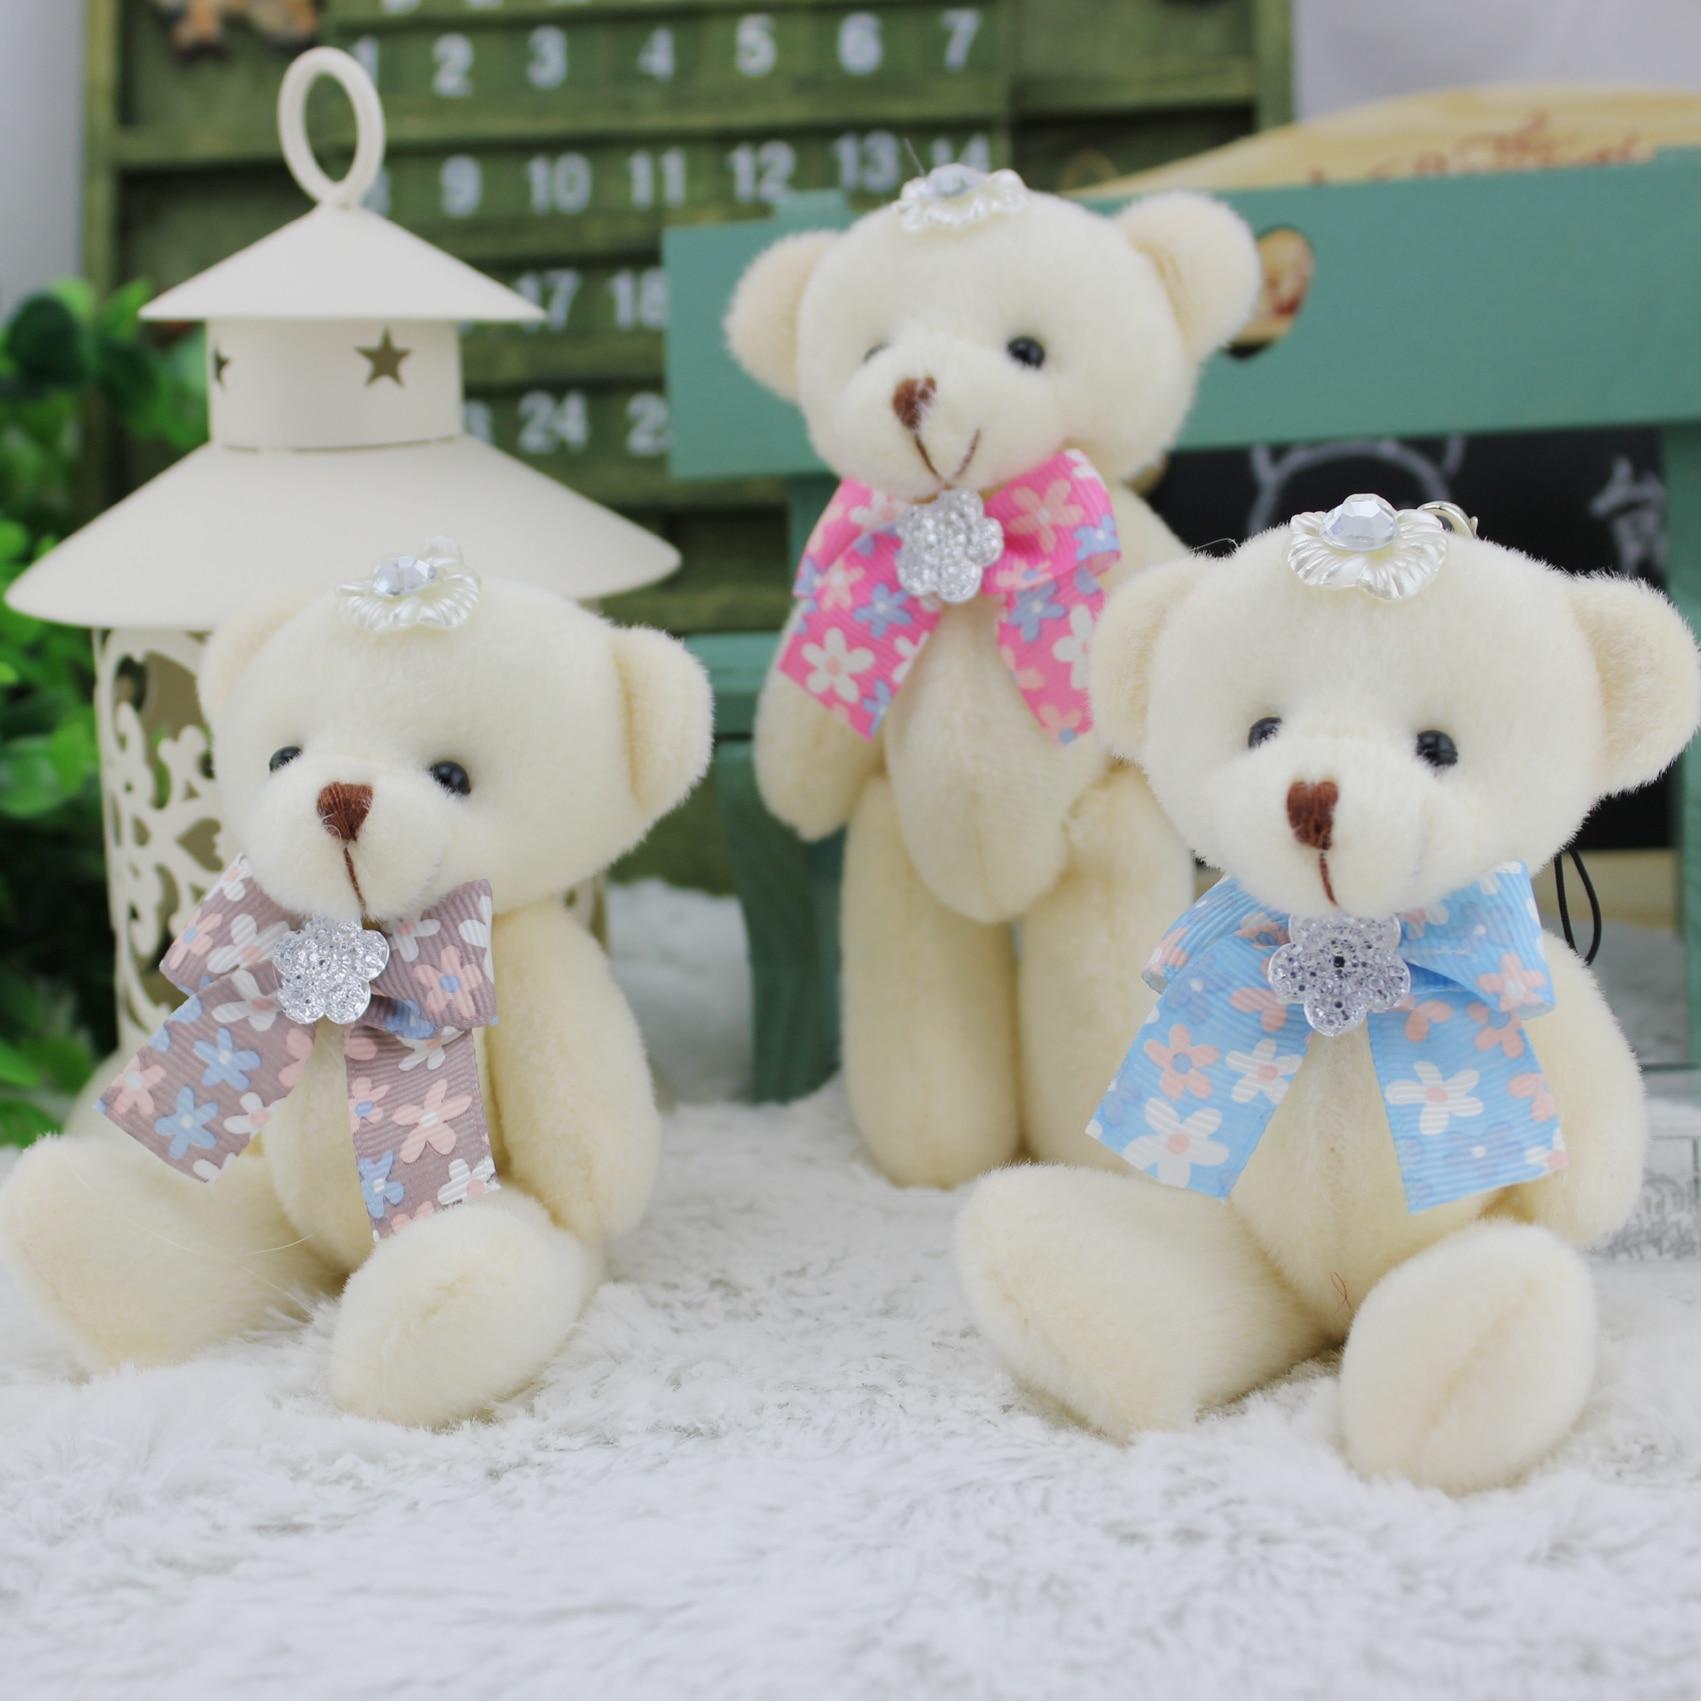 ②Juguetes bolsa de regalo de boda pajarita colgante flor muñeca ...